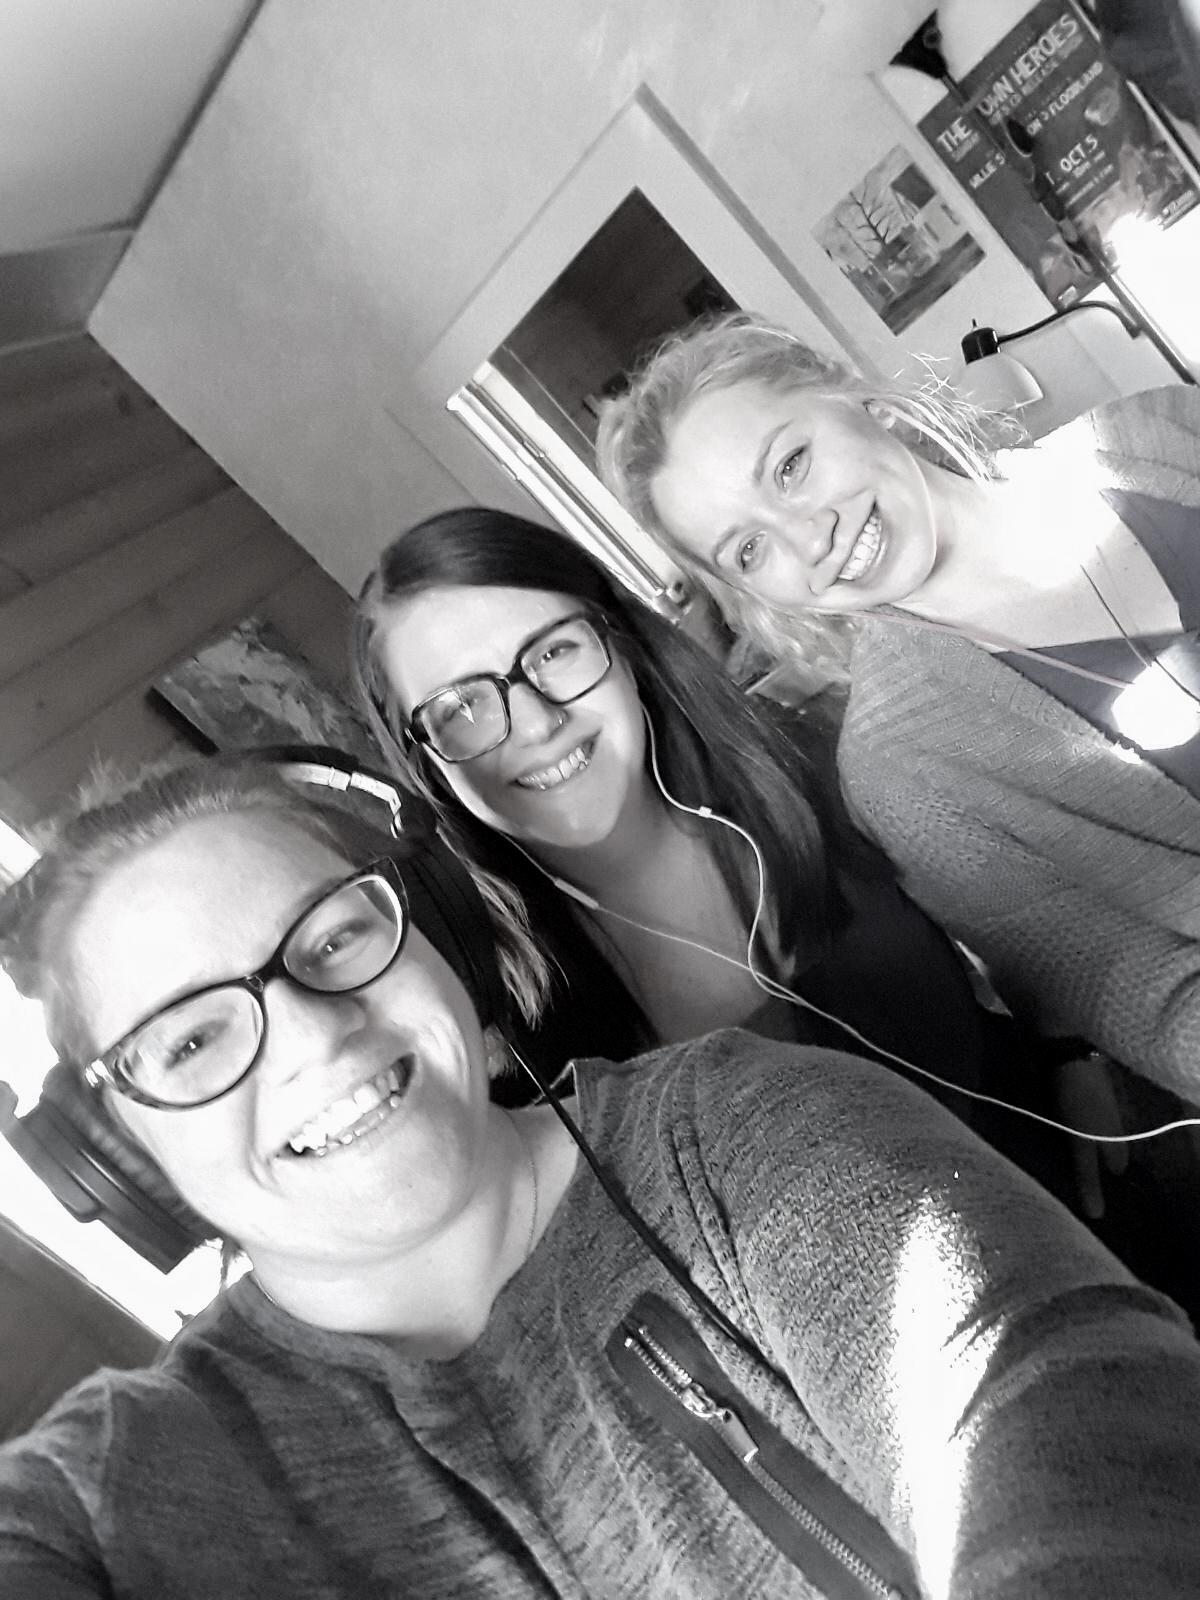 Friends singing songs together (Stefanie Smiley, Sara Mader, Kristen Herrington)